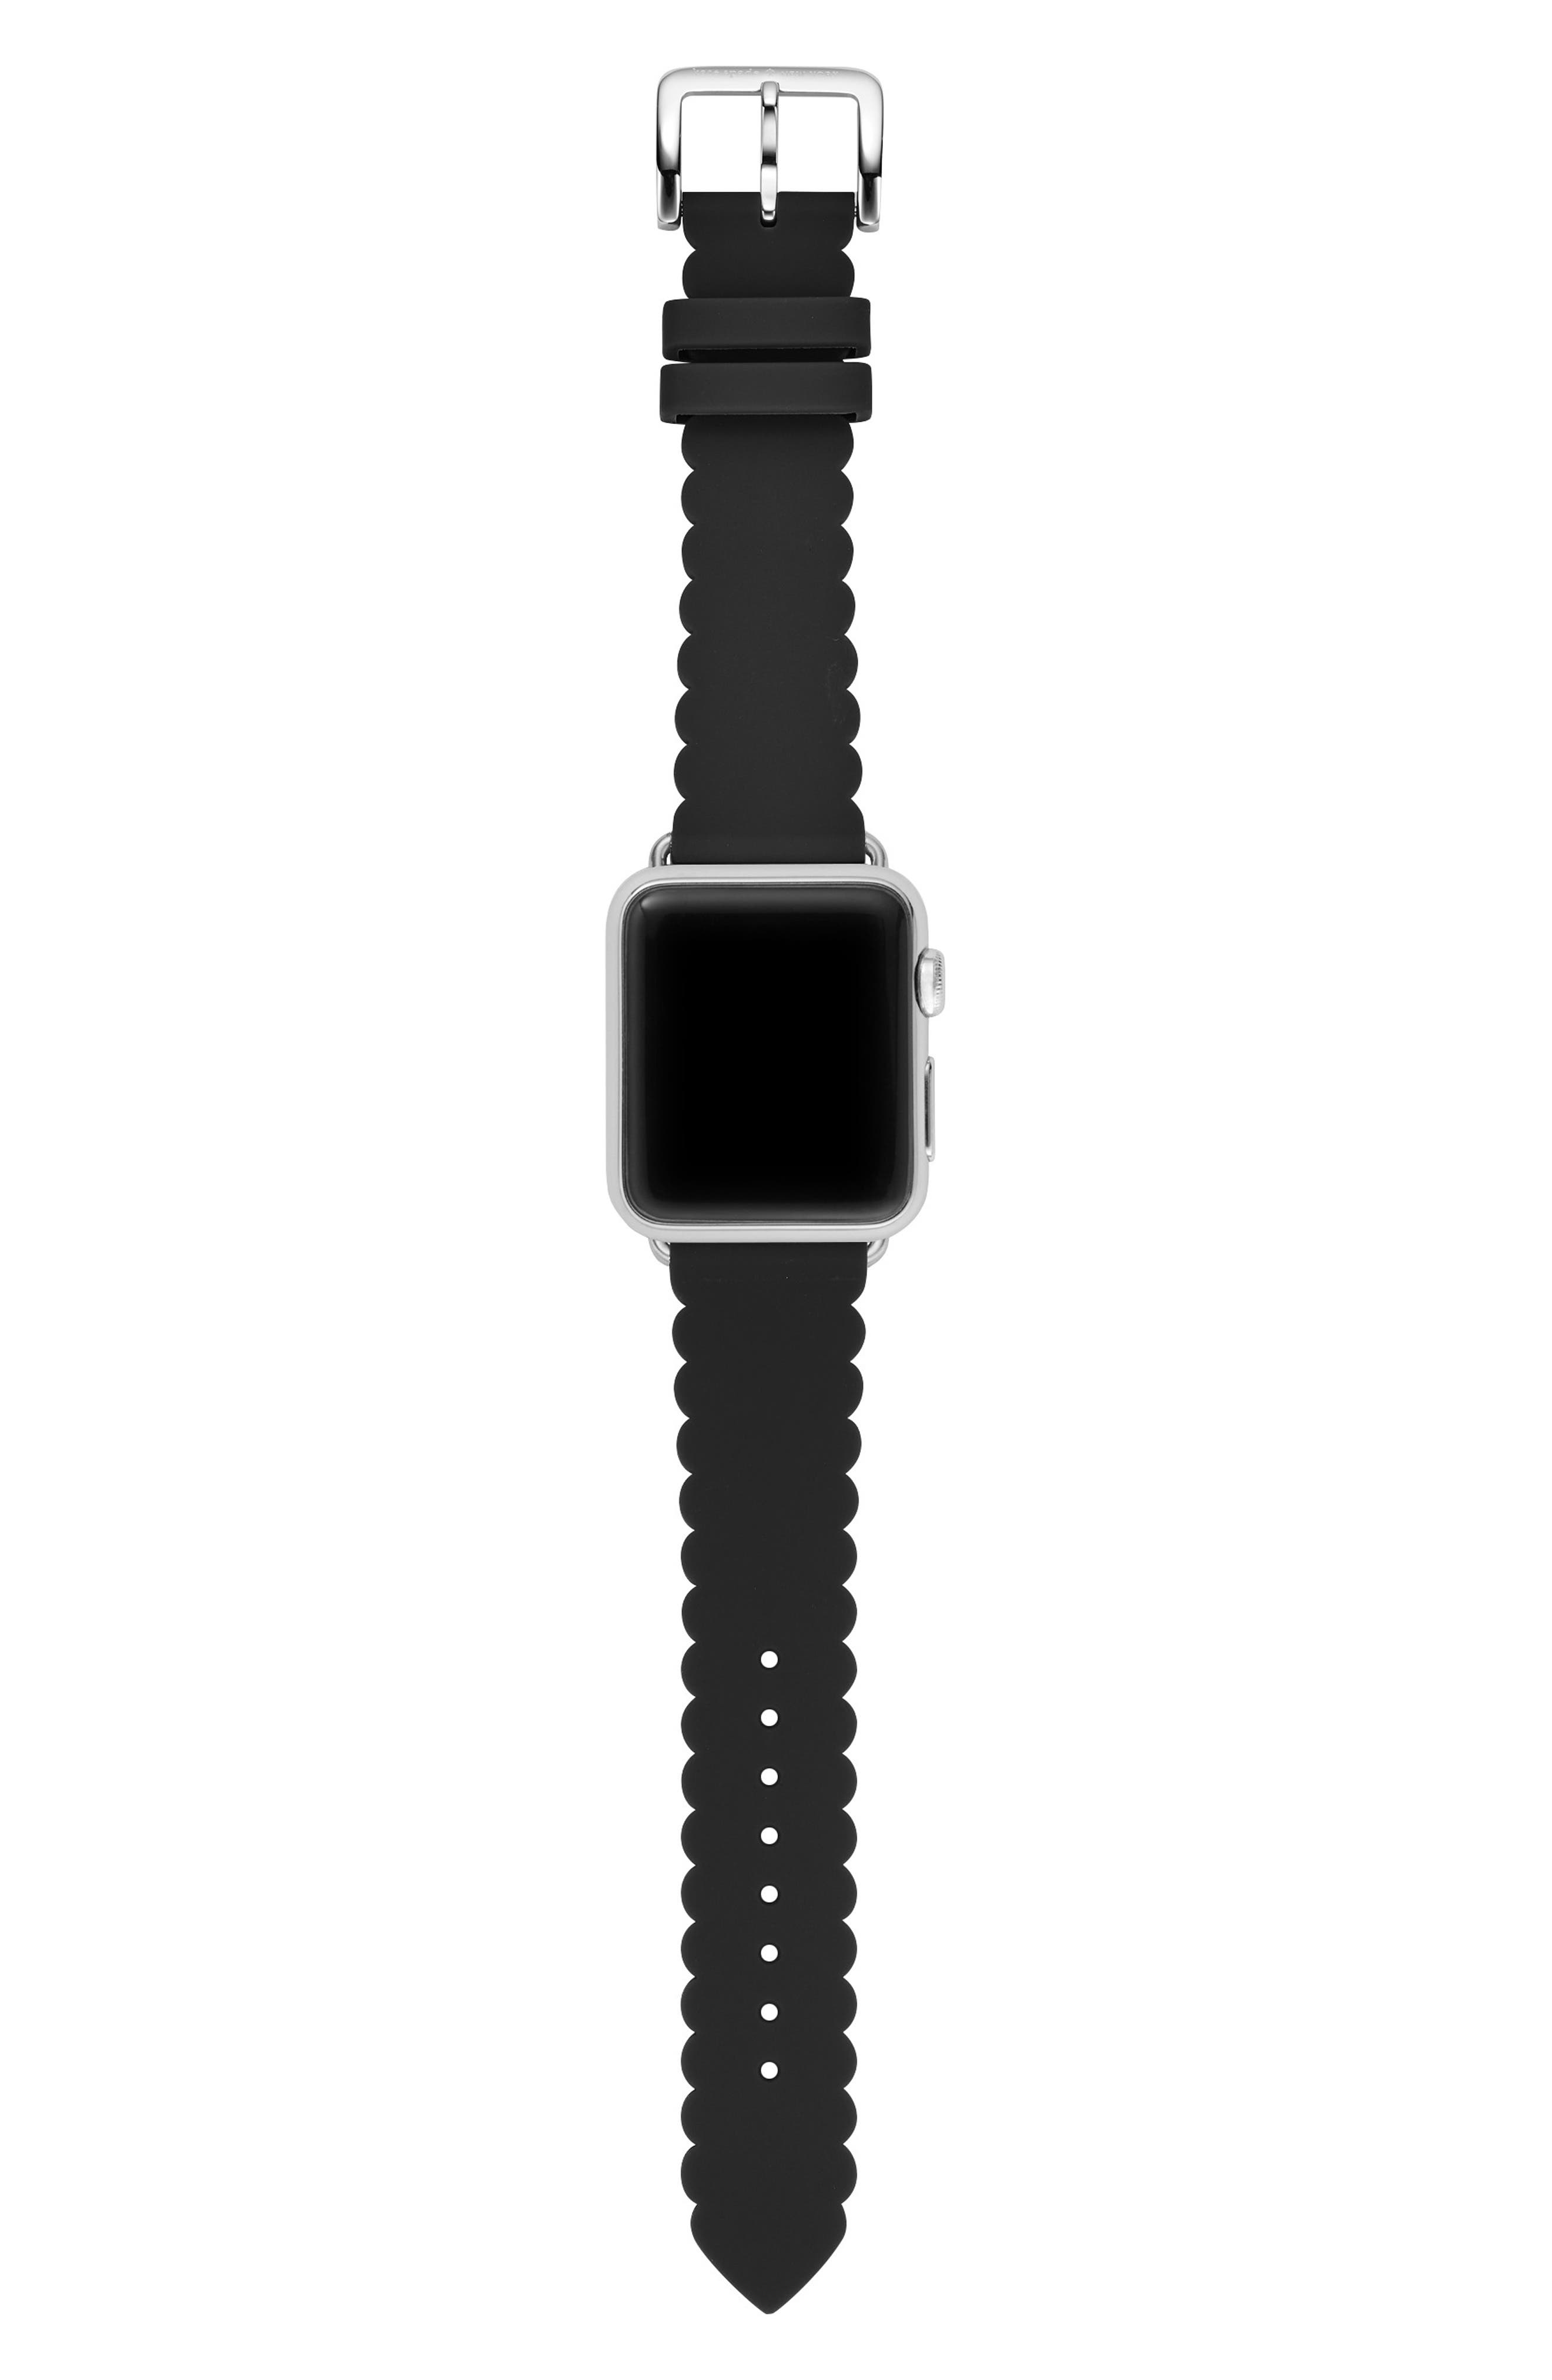 Apple Watch strap, 38mm, Main, color, BLACK